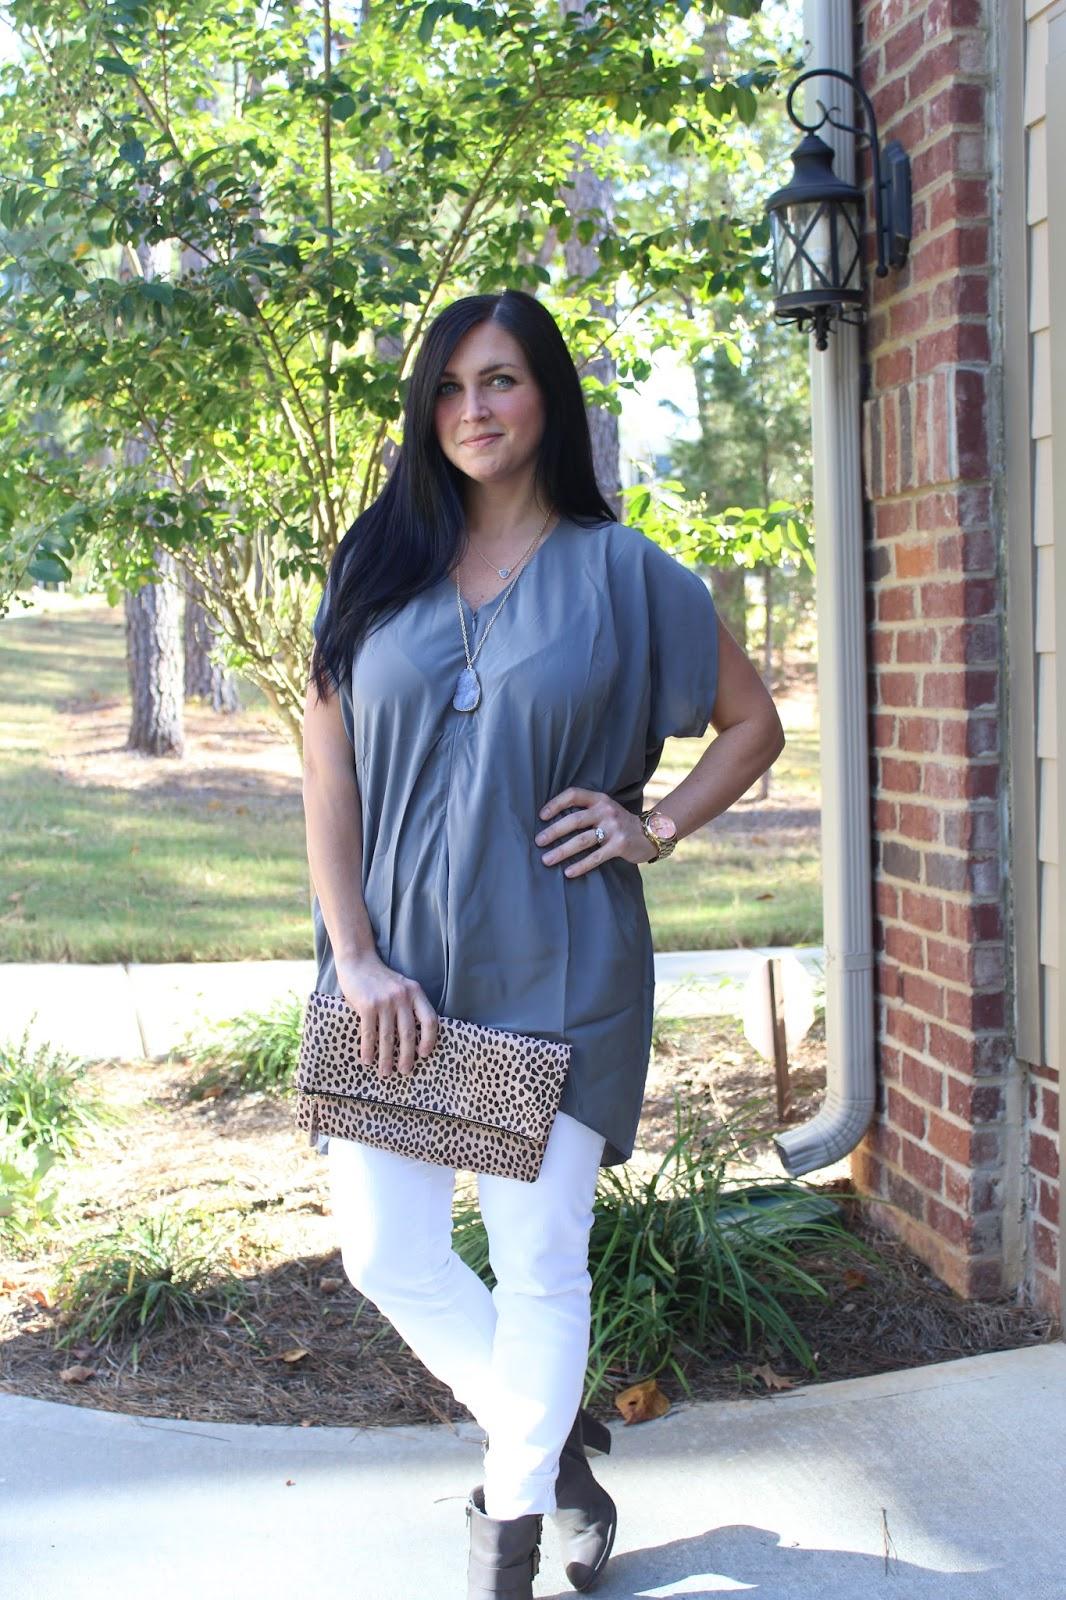 White jeans, grey tunic, leopard folder clutch, nursing friendly